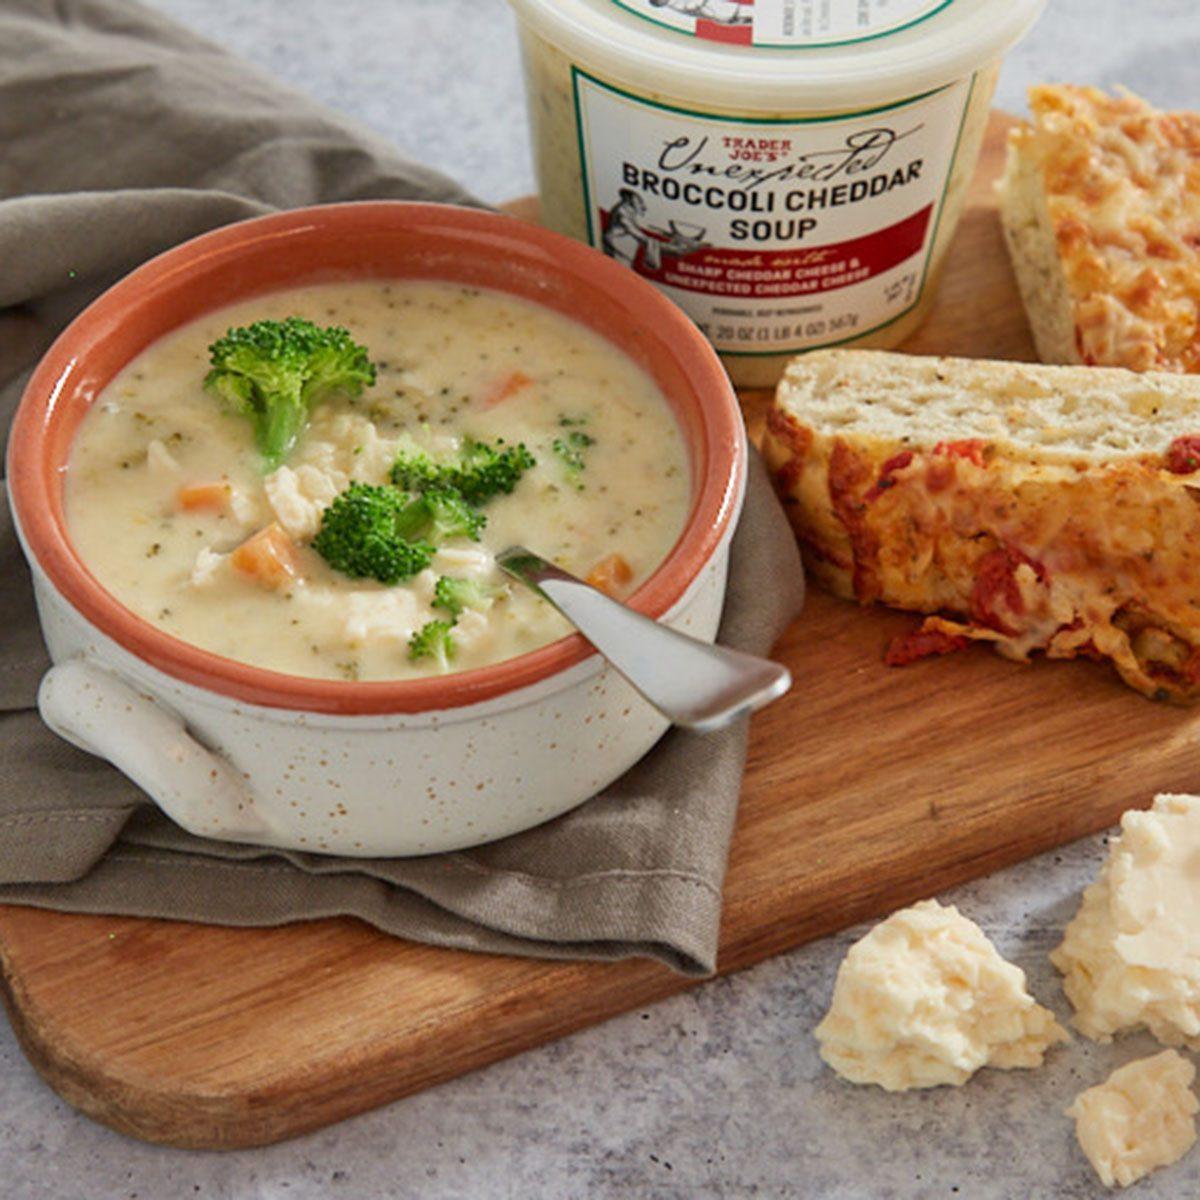 Trader Joe's Cheddar Broccoli Soup